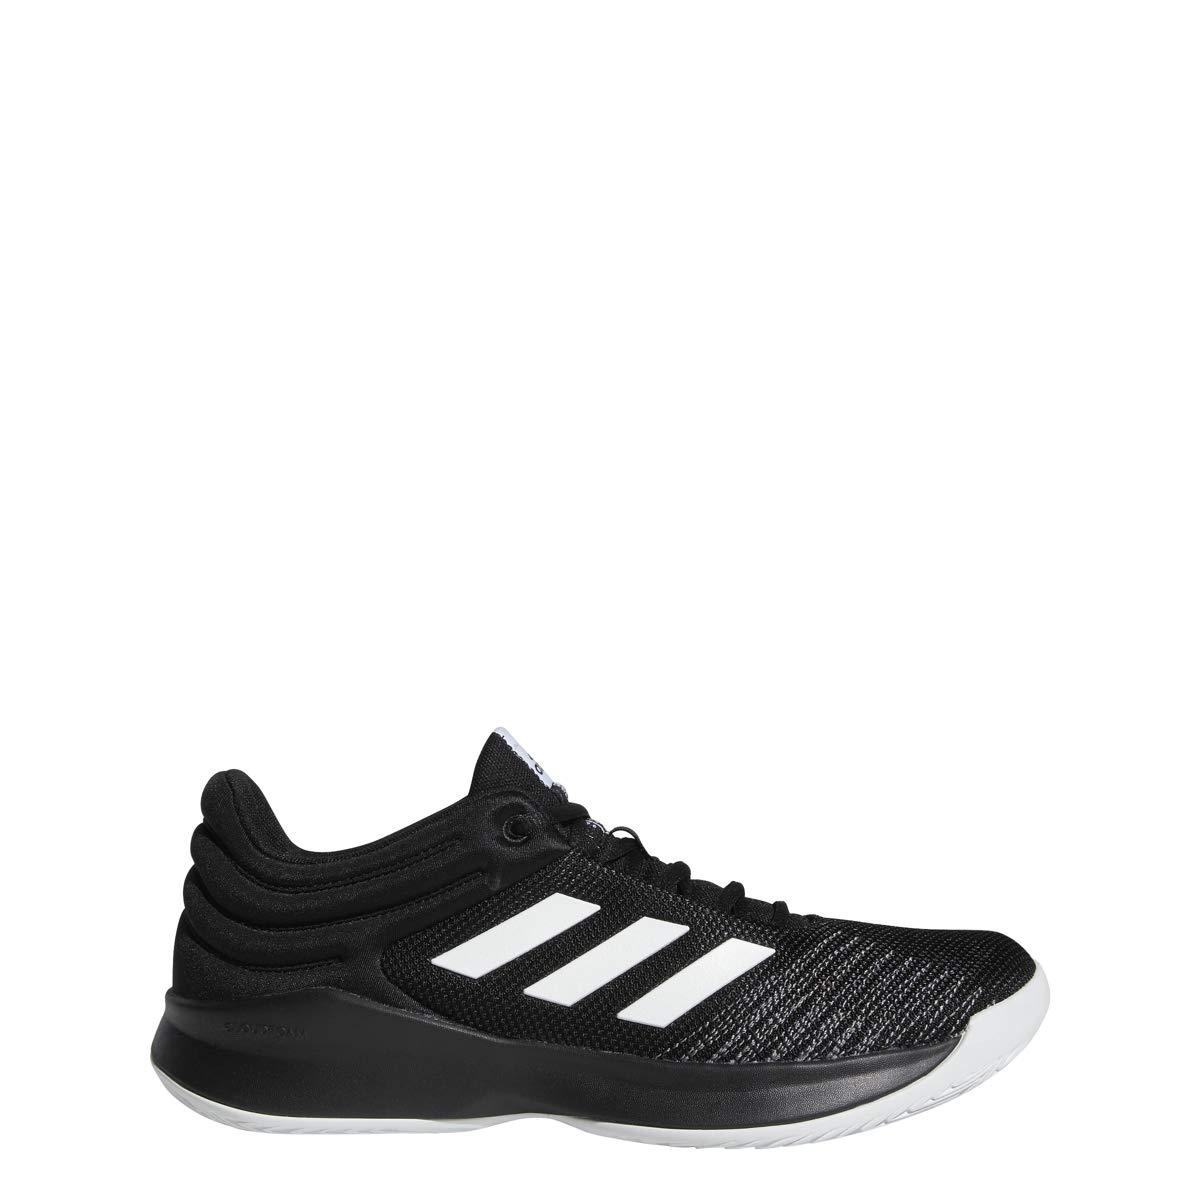 Galleon Adidas Mens Pro Spark Low 2018 Basketball Shoe Black